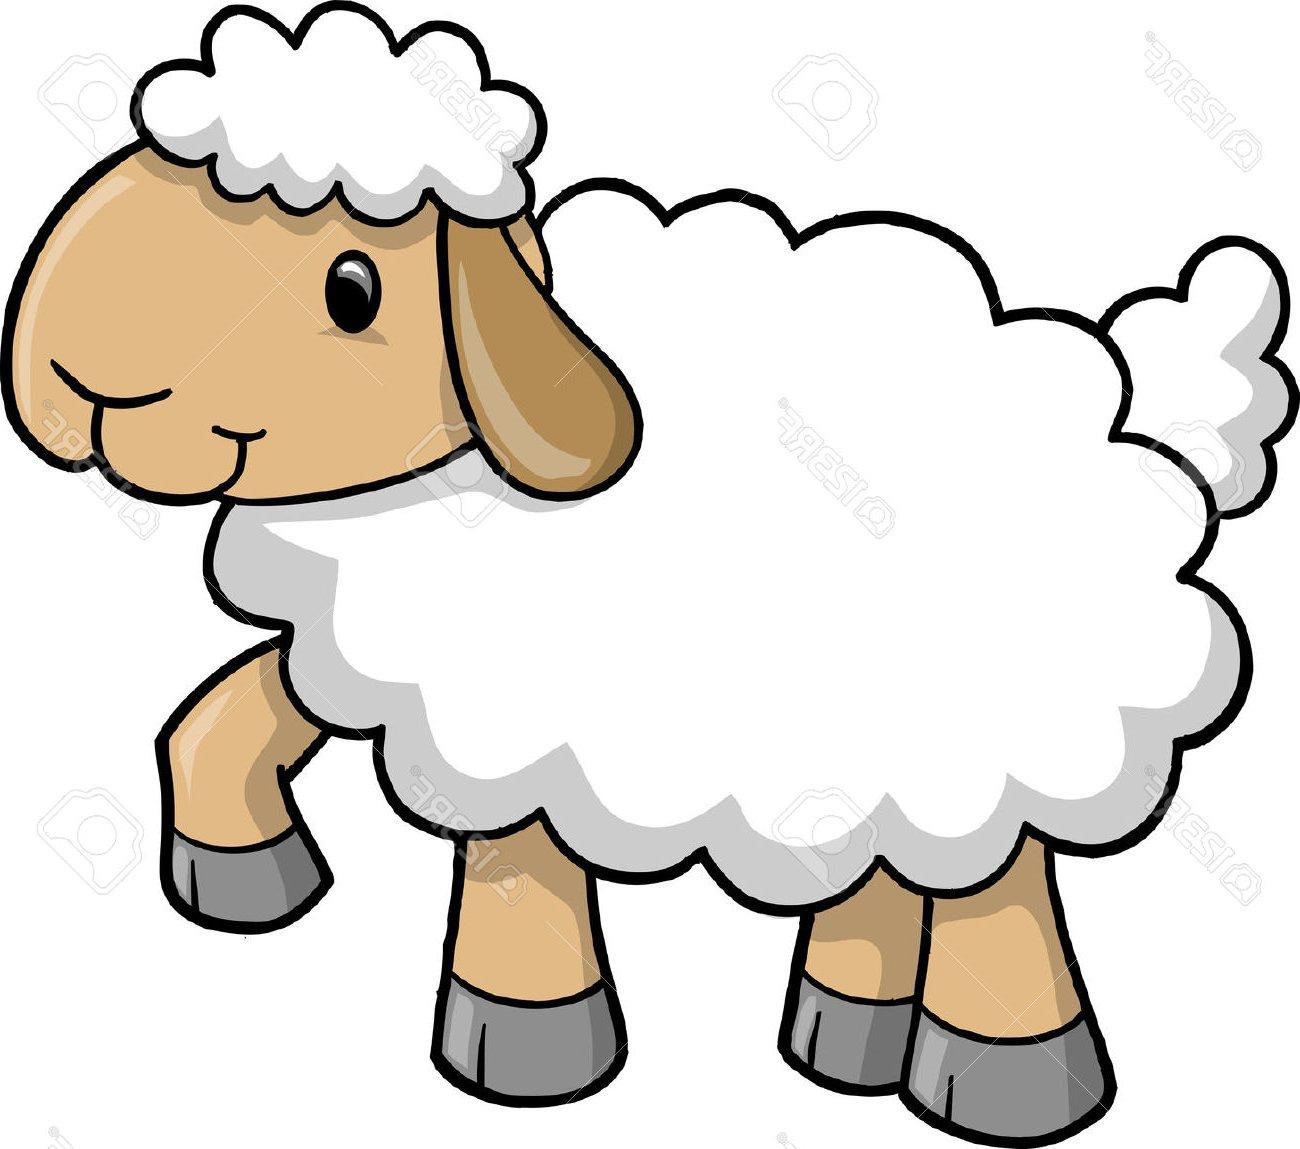 Easter at getdrawings com. Lamb clipart